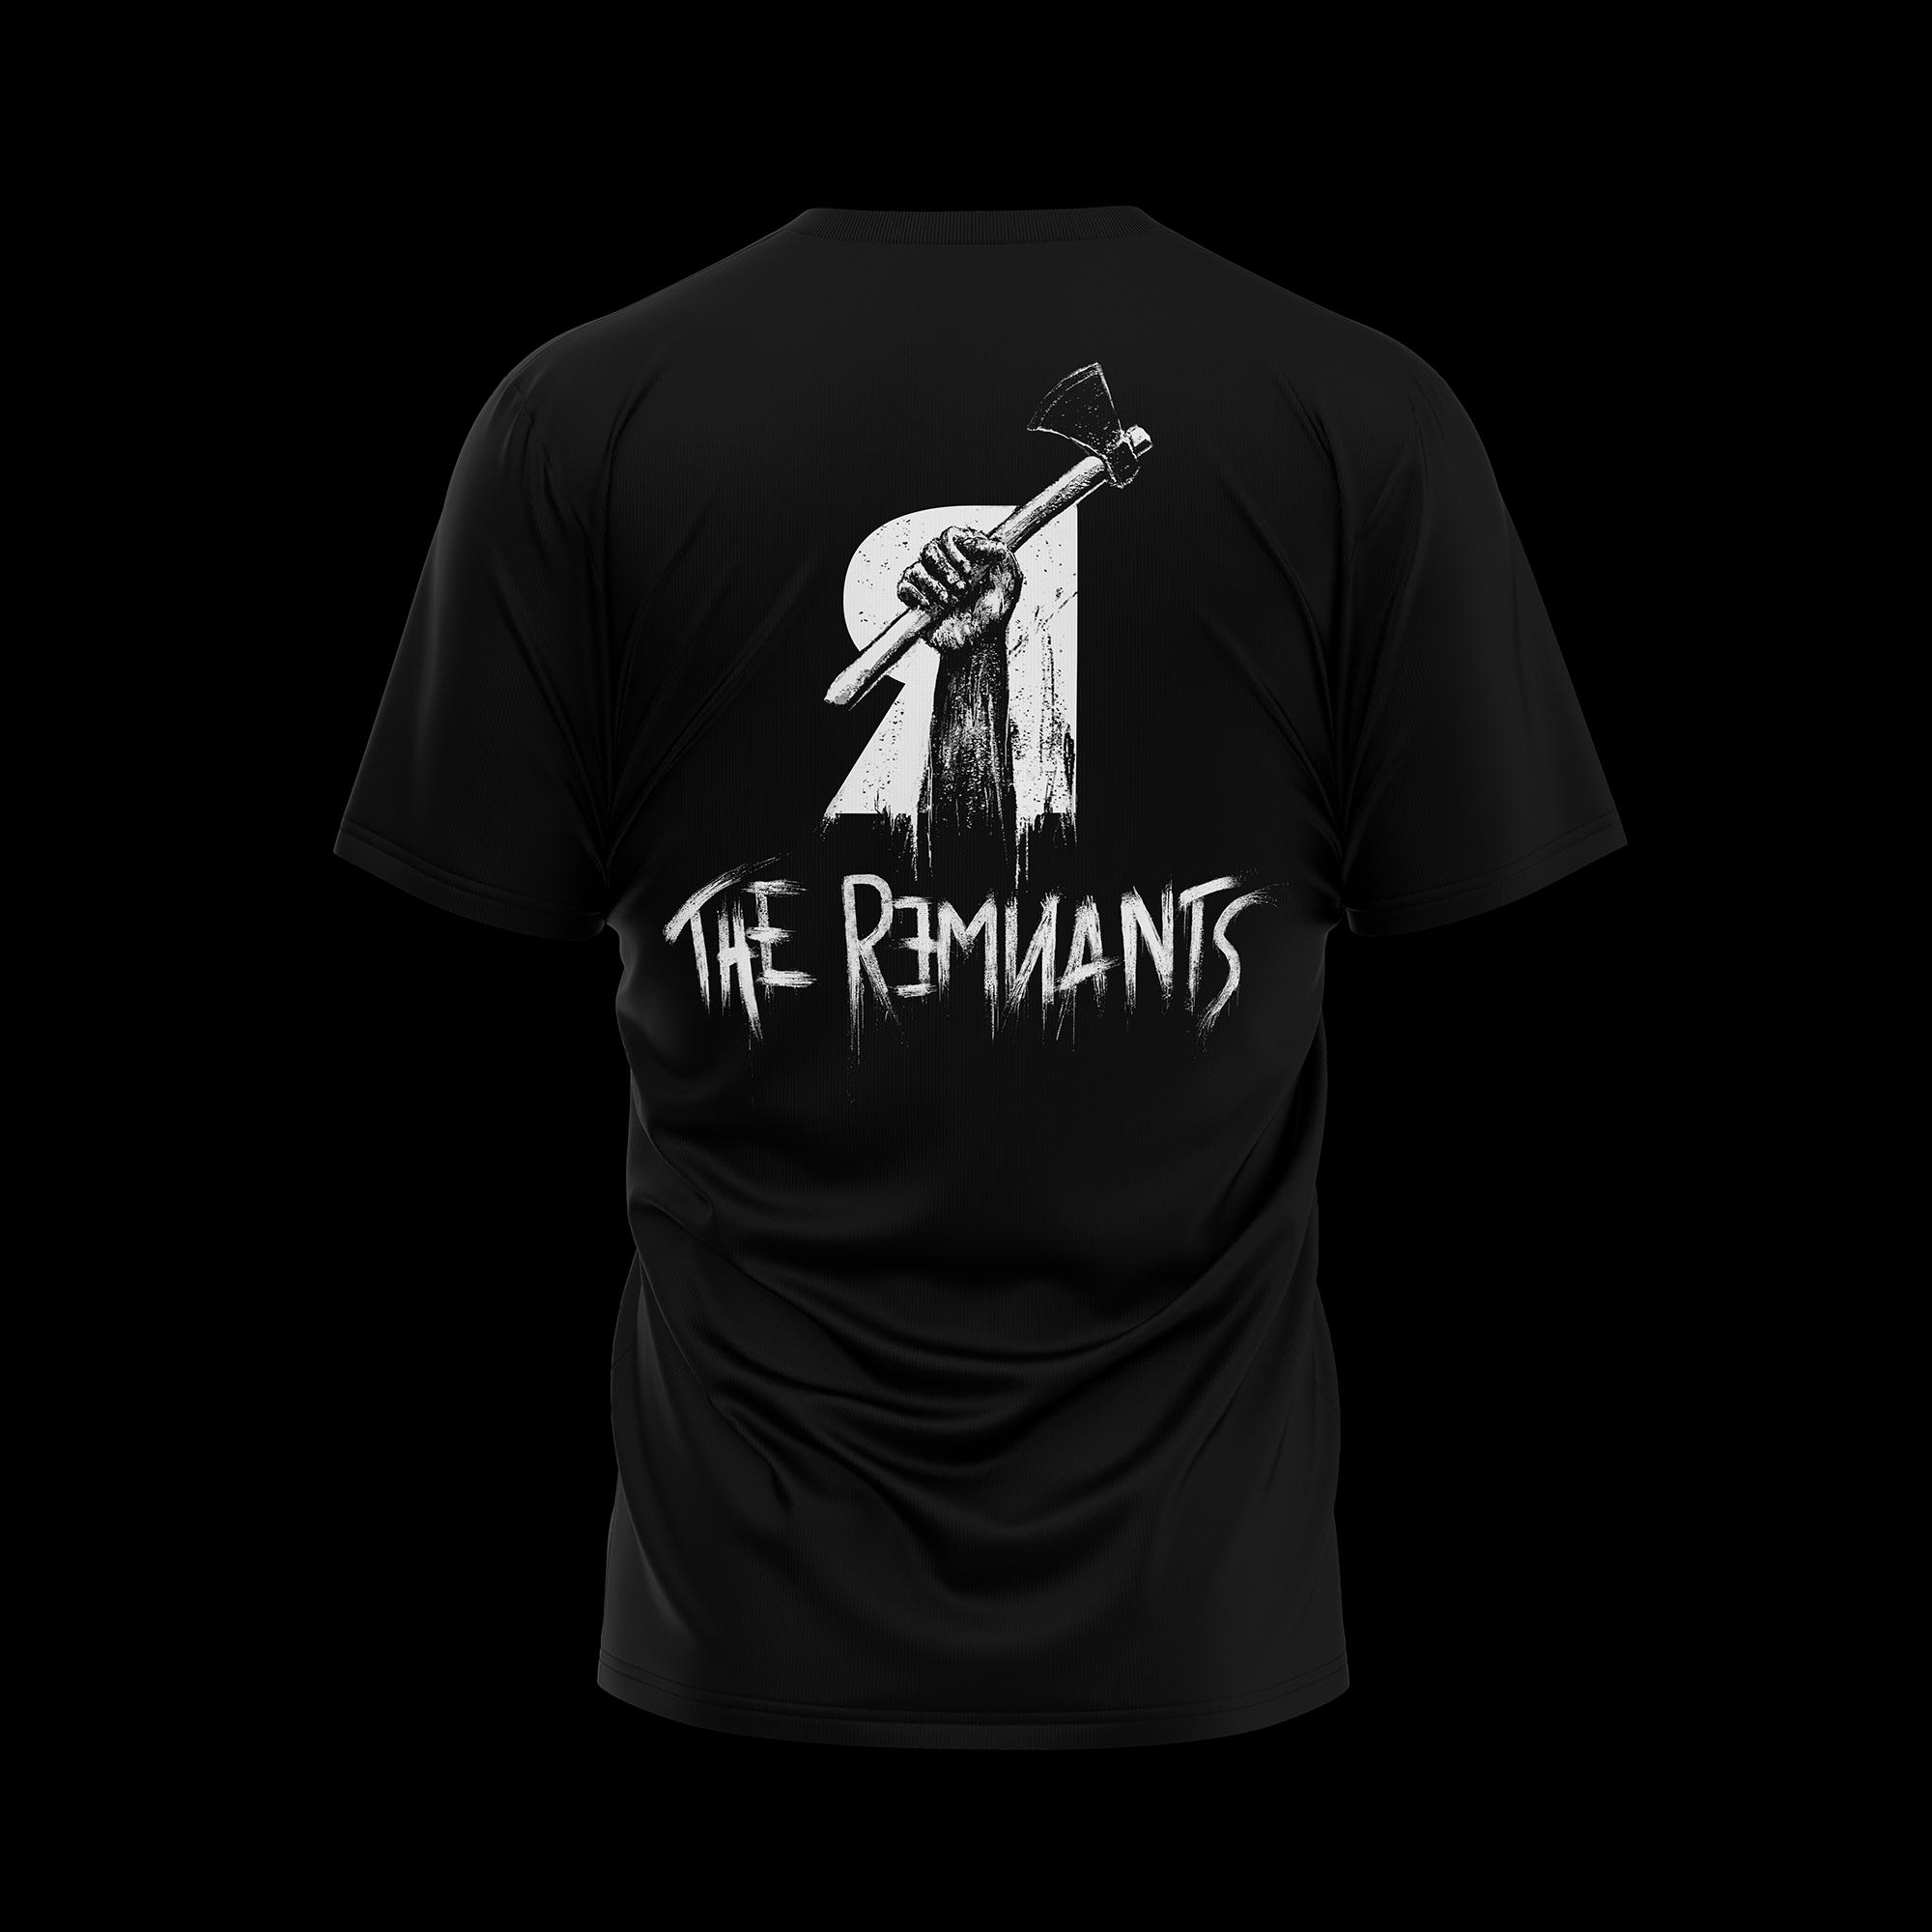 The Remnants - Back Mockup (small).jpg